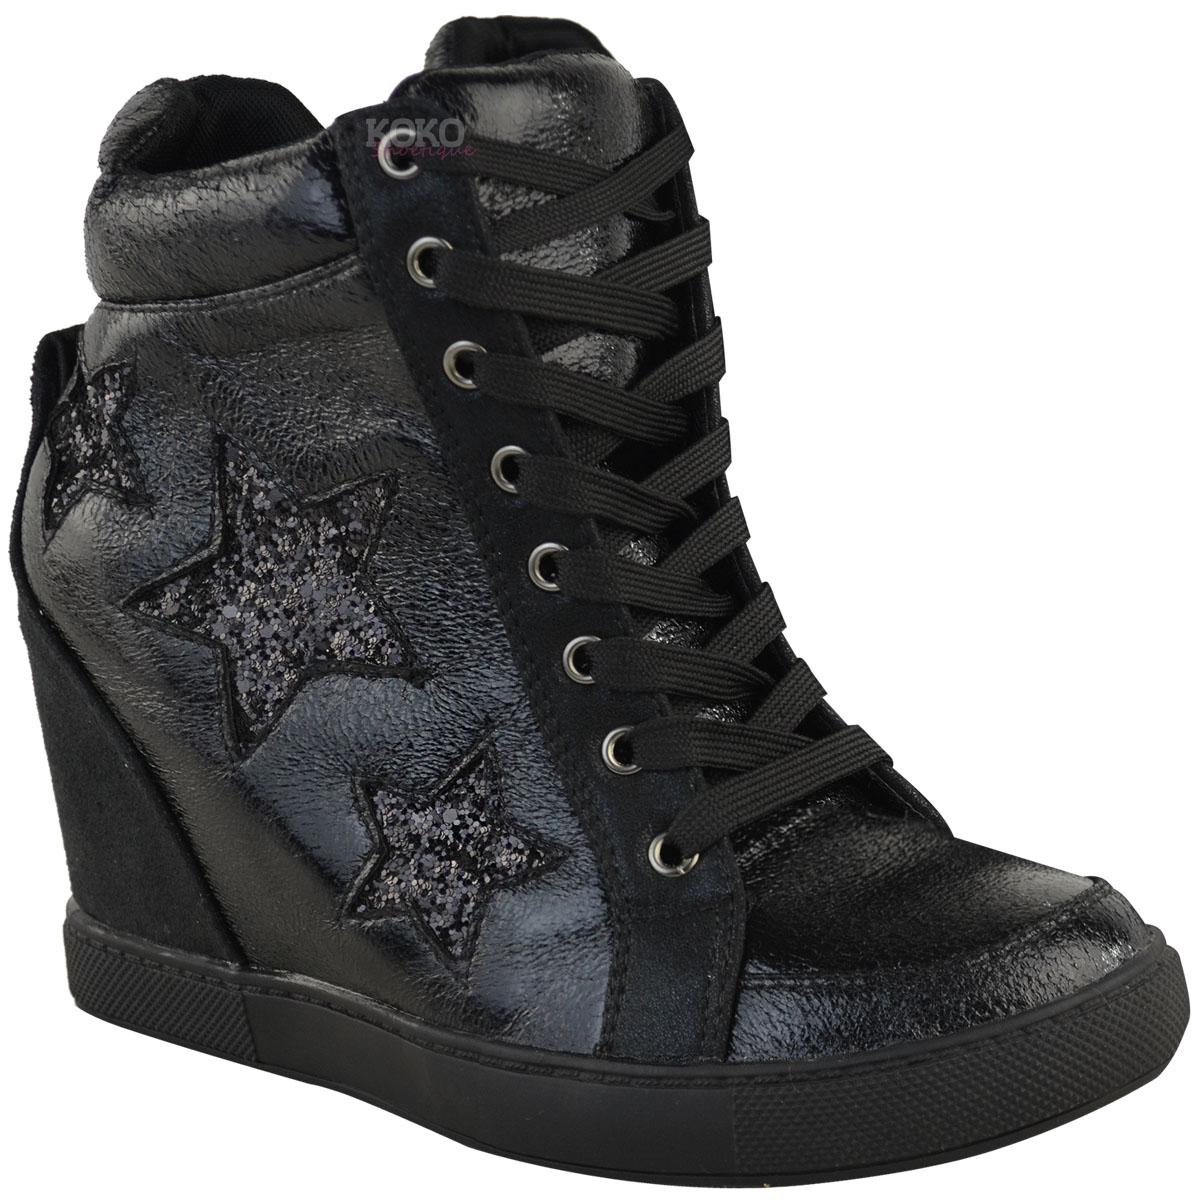 Women Casual Shoes Hidden Increasing Platform Sneakers PU